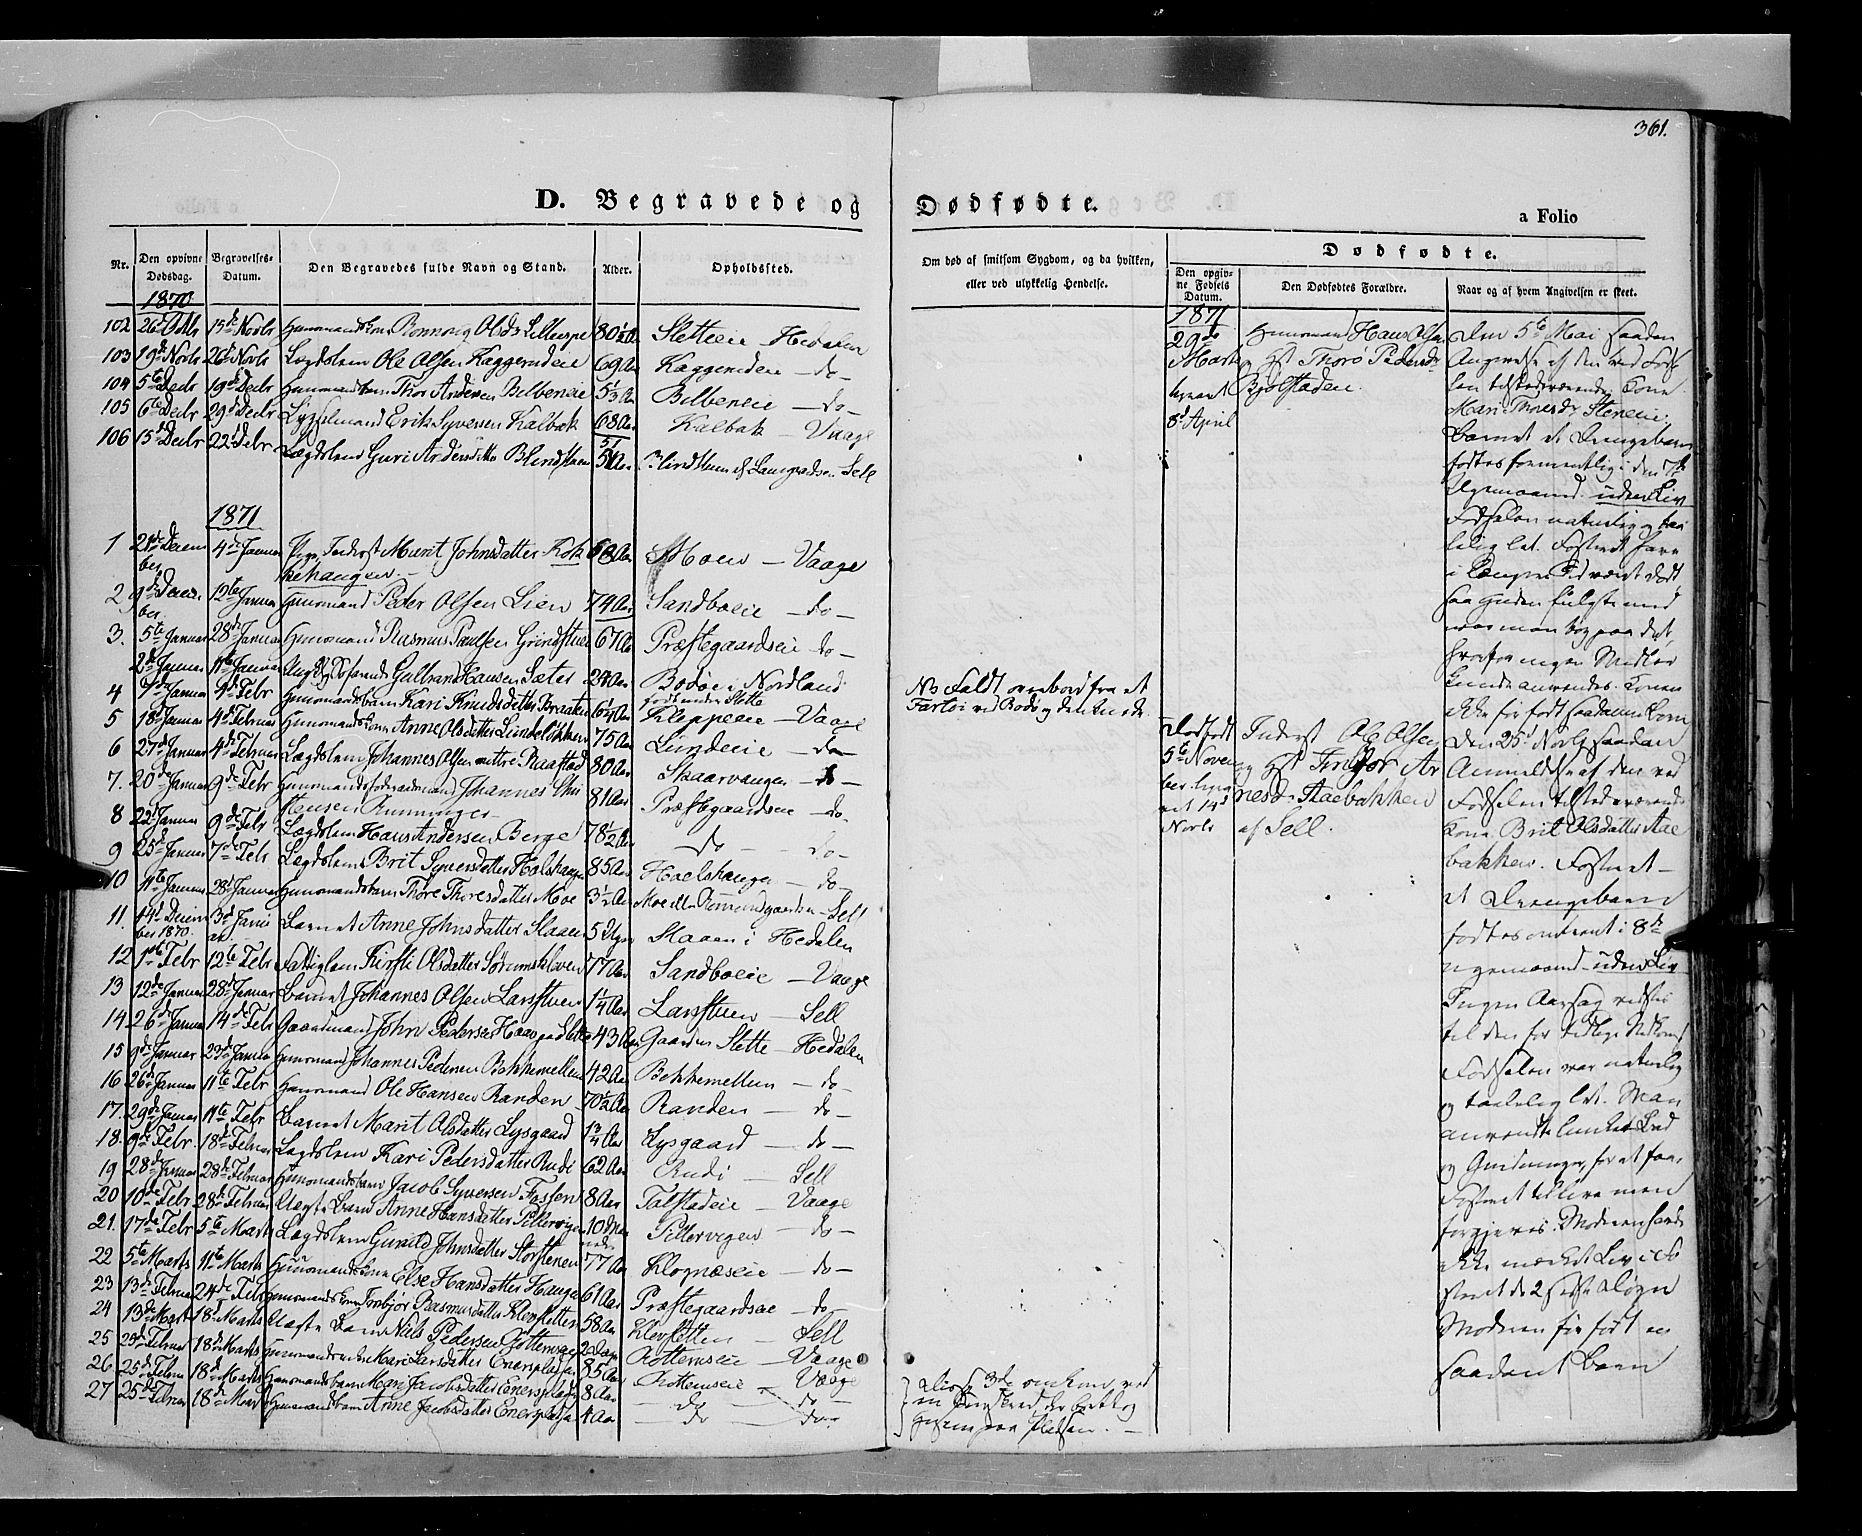 SAH, Vågå prestekontor, Ministerialbok nr. 6 /1, 1856-1872, s. 361